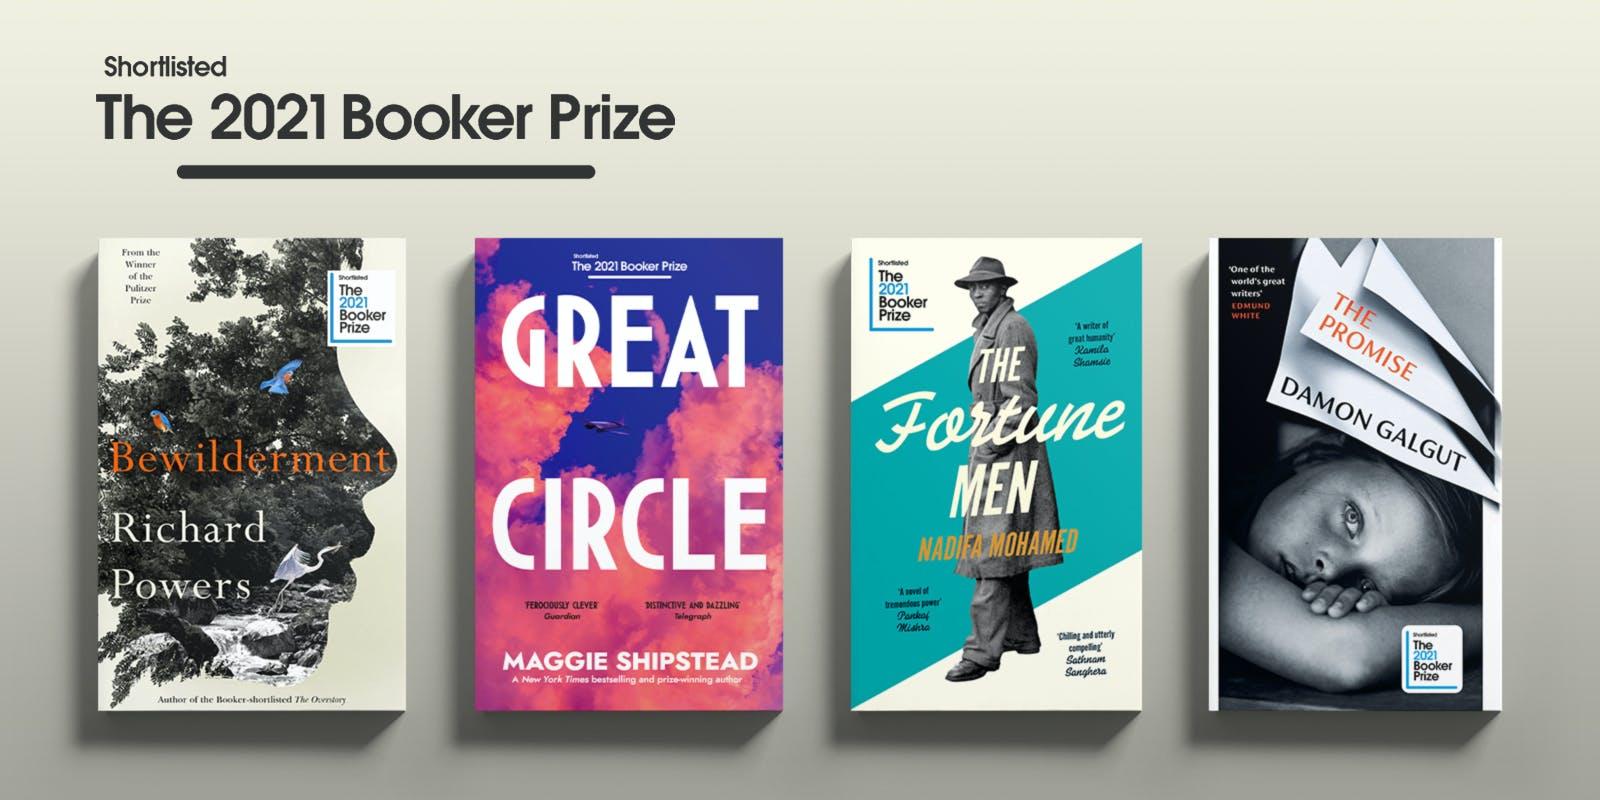 The 2021 Booker Prize shortlist revealed